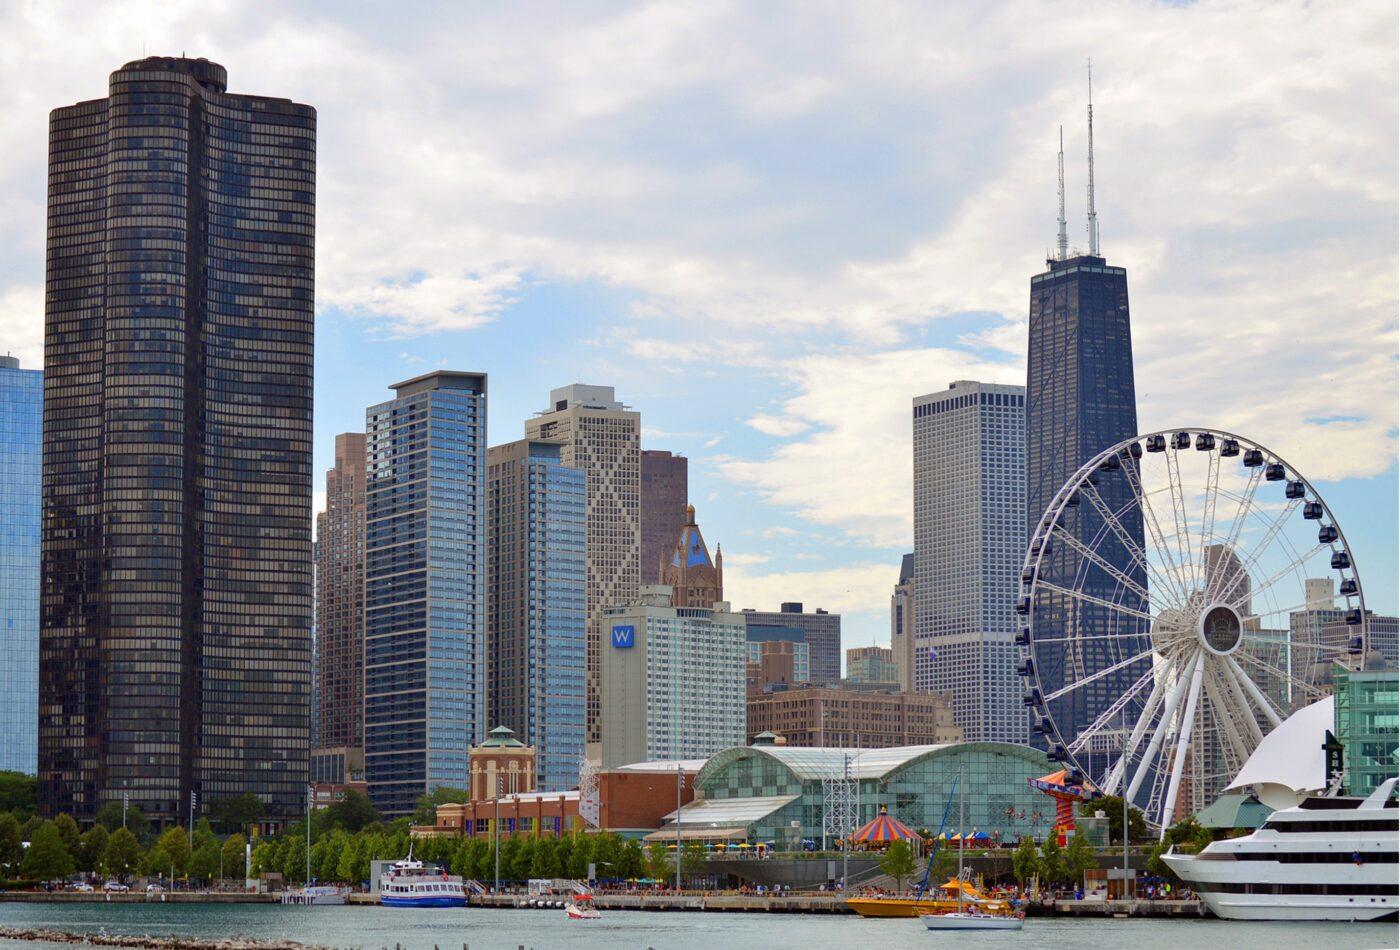 Detroit Michigan Explore the Museums